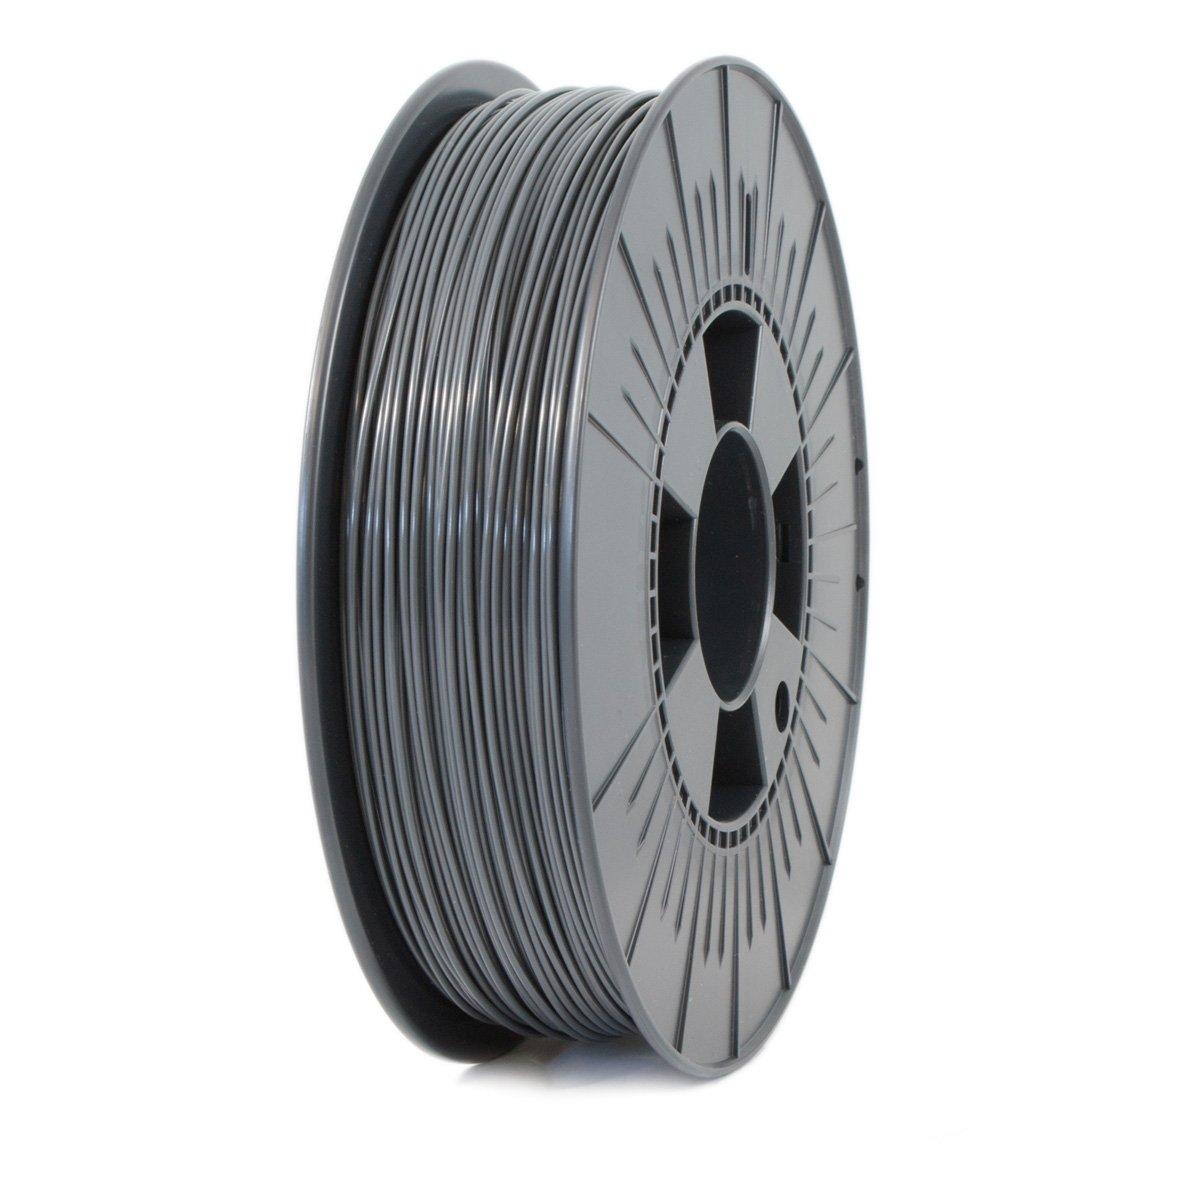 Ice Filaments ICEFIL1PLA015 Filamento PLA, 1,75 mm, 0,75 kg, Gris